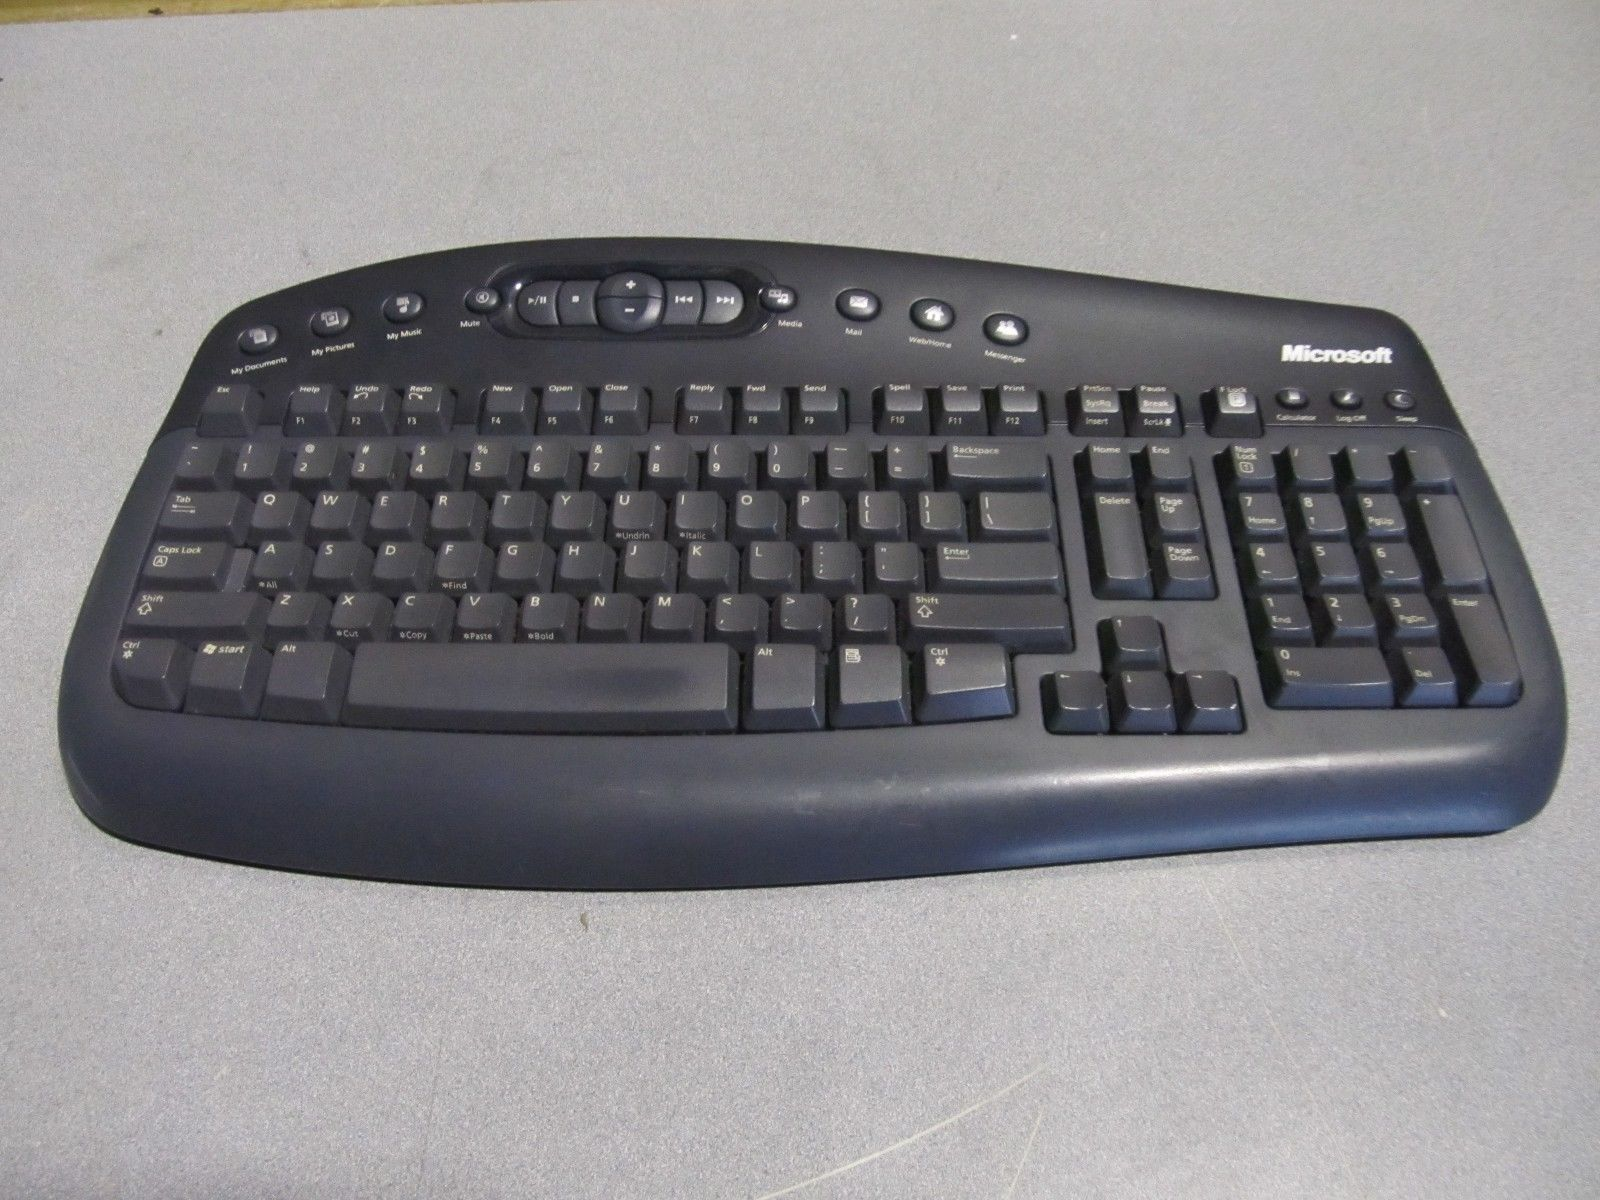 OEM microsoft wireless multimedia keyboard and 50 similar items